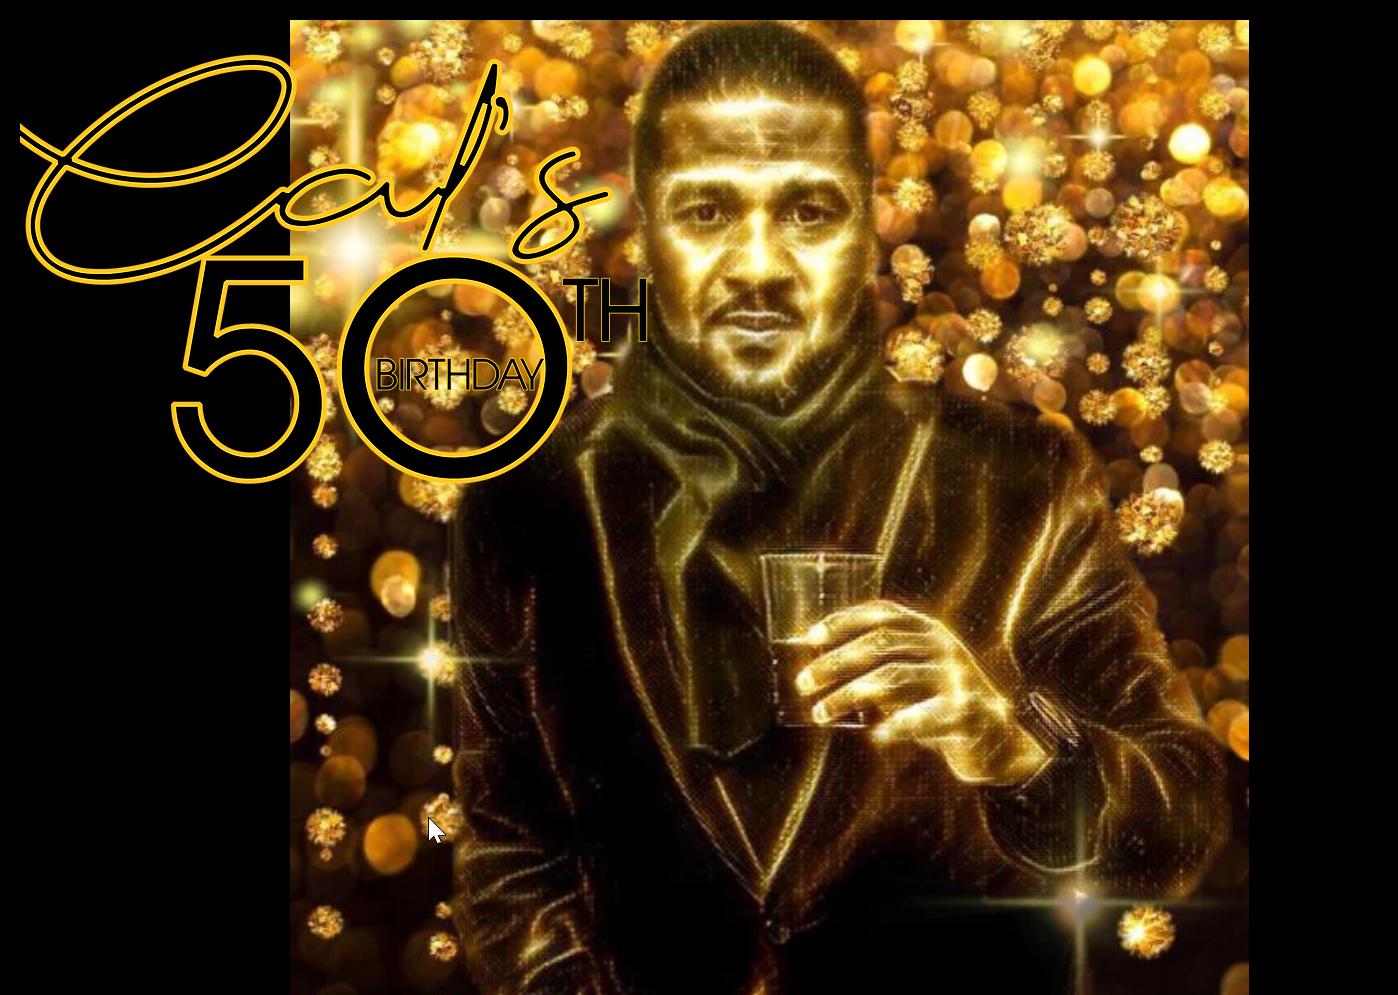 Cal's 50th Birthday!